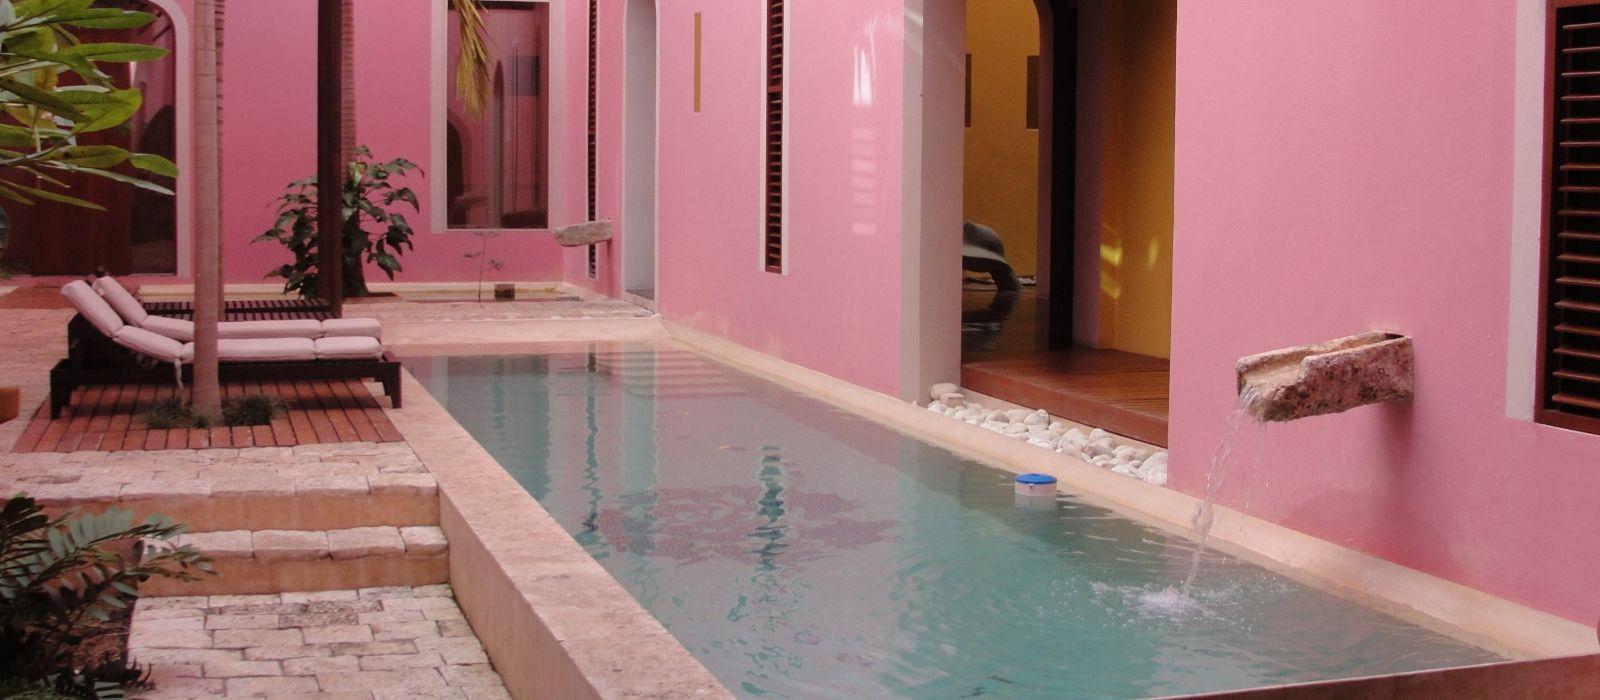 Hotel Rosas & Xocolate Boutique  & Spa Mexico